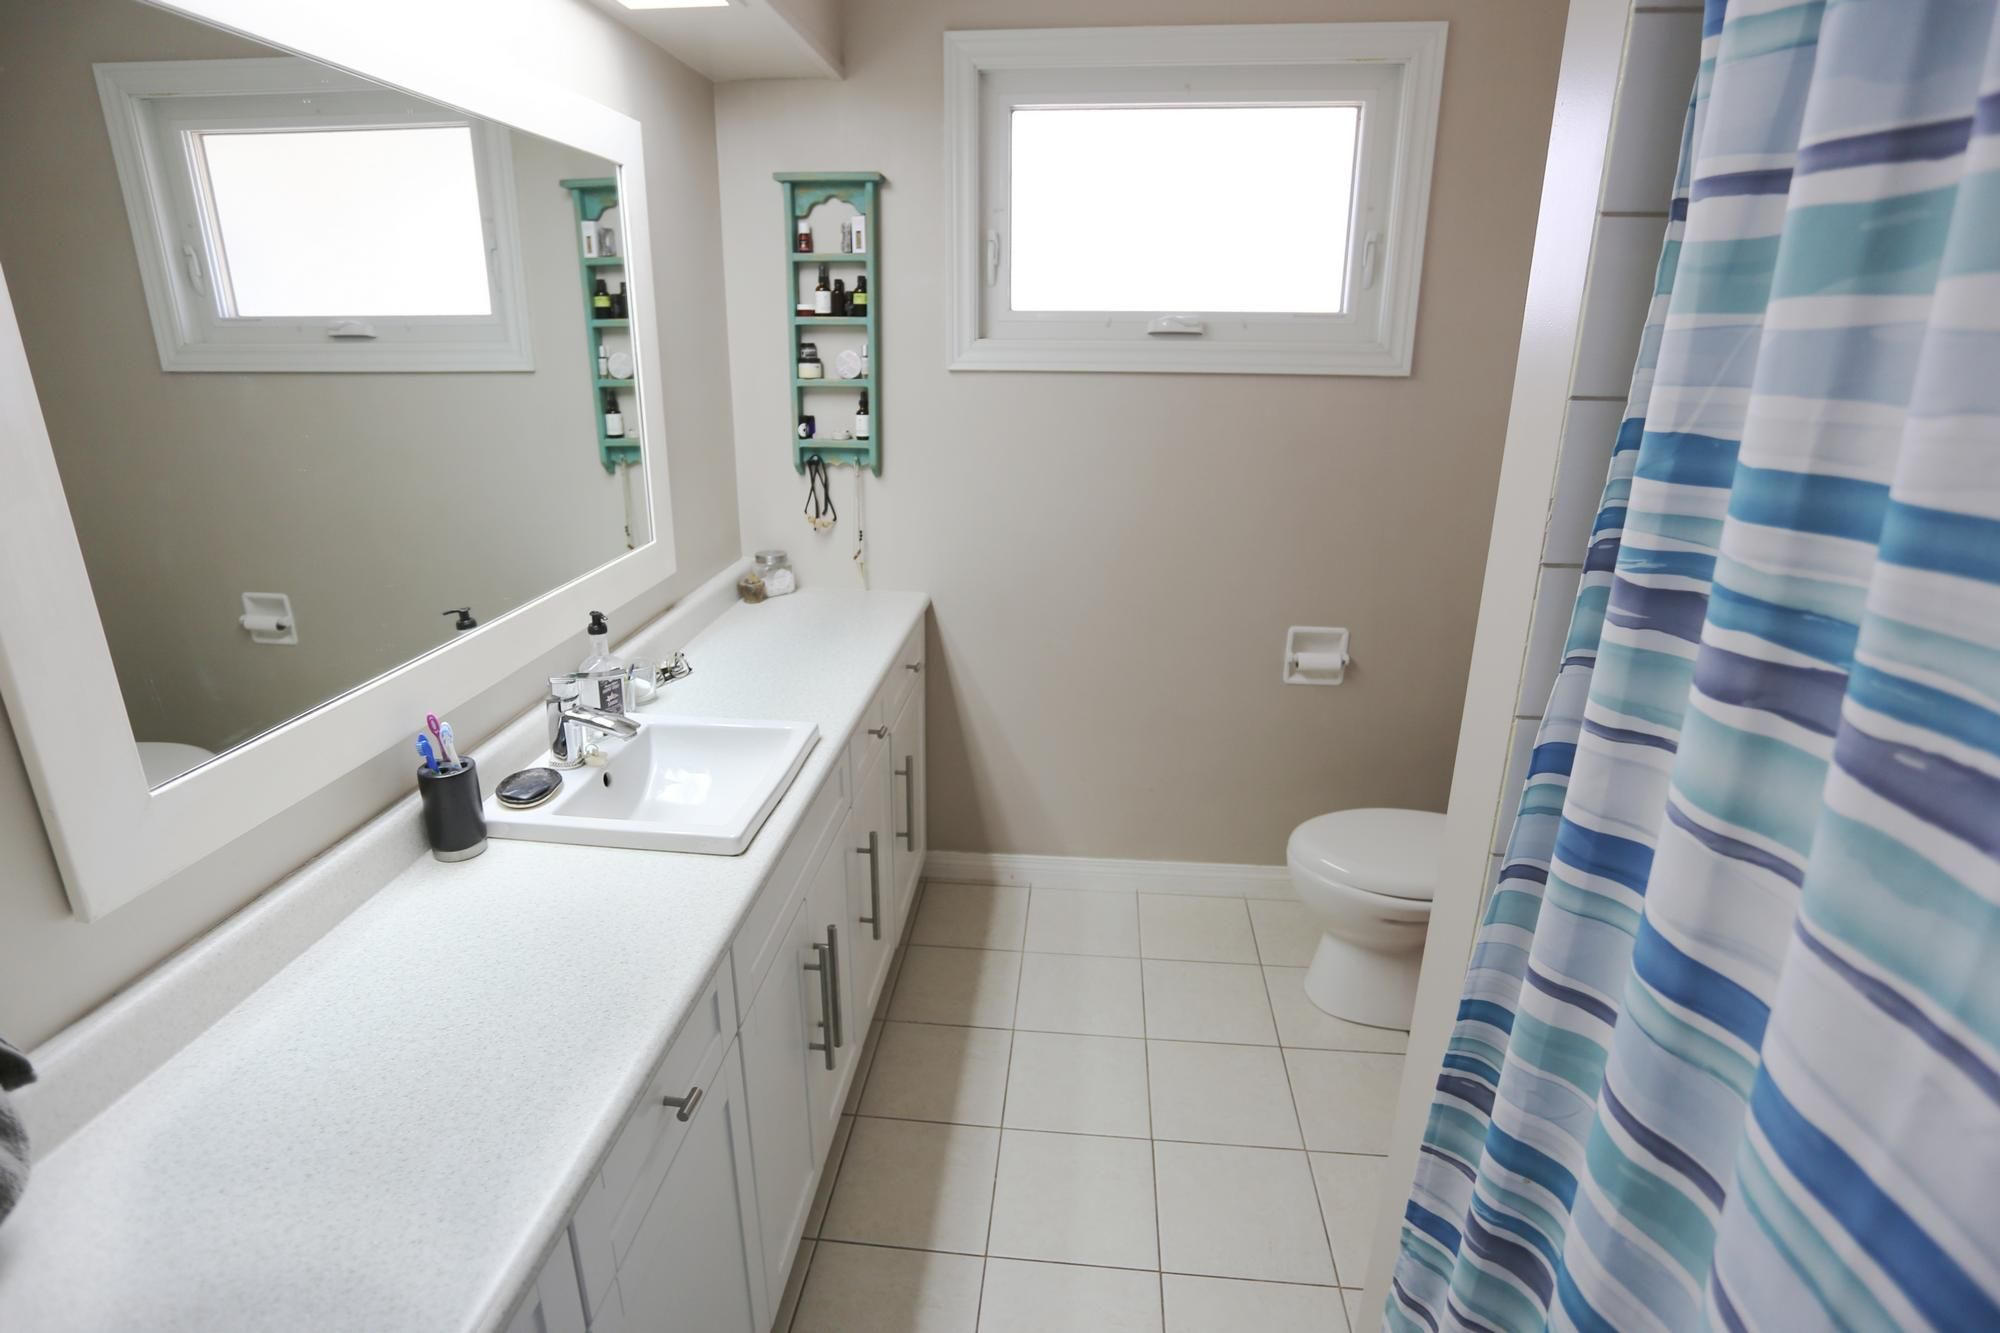 Photo 18: Photos: 1322 Valour Road in Winnipeg: Sargent Park Single Family Detached for sale (5C)  : MLS®# 1811835